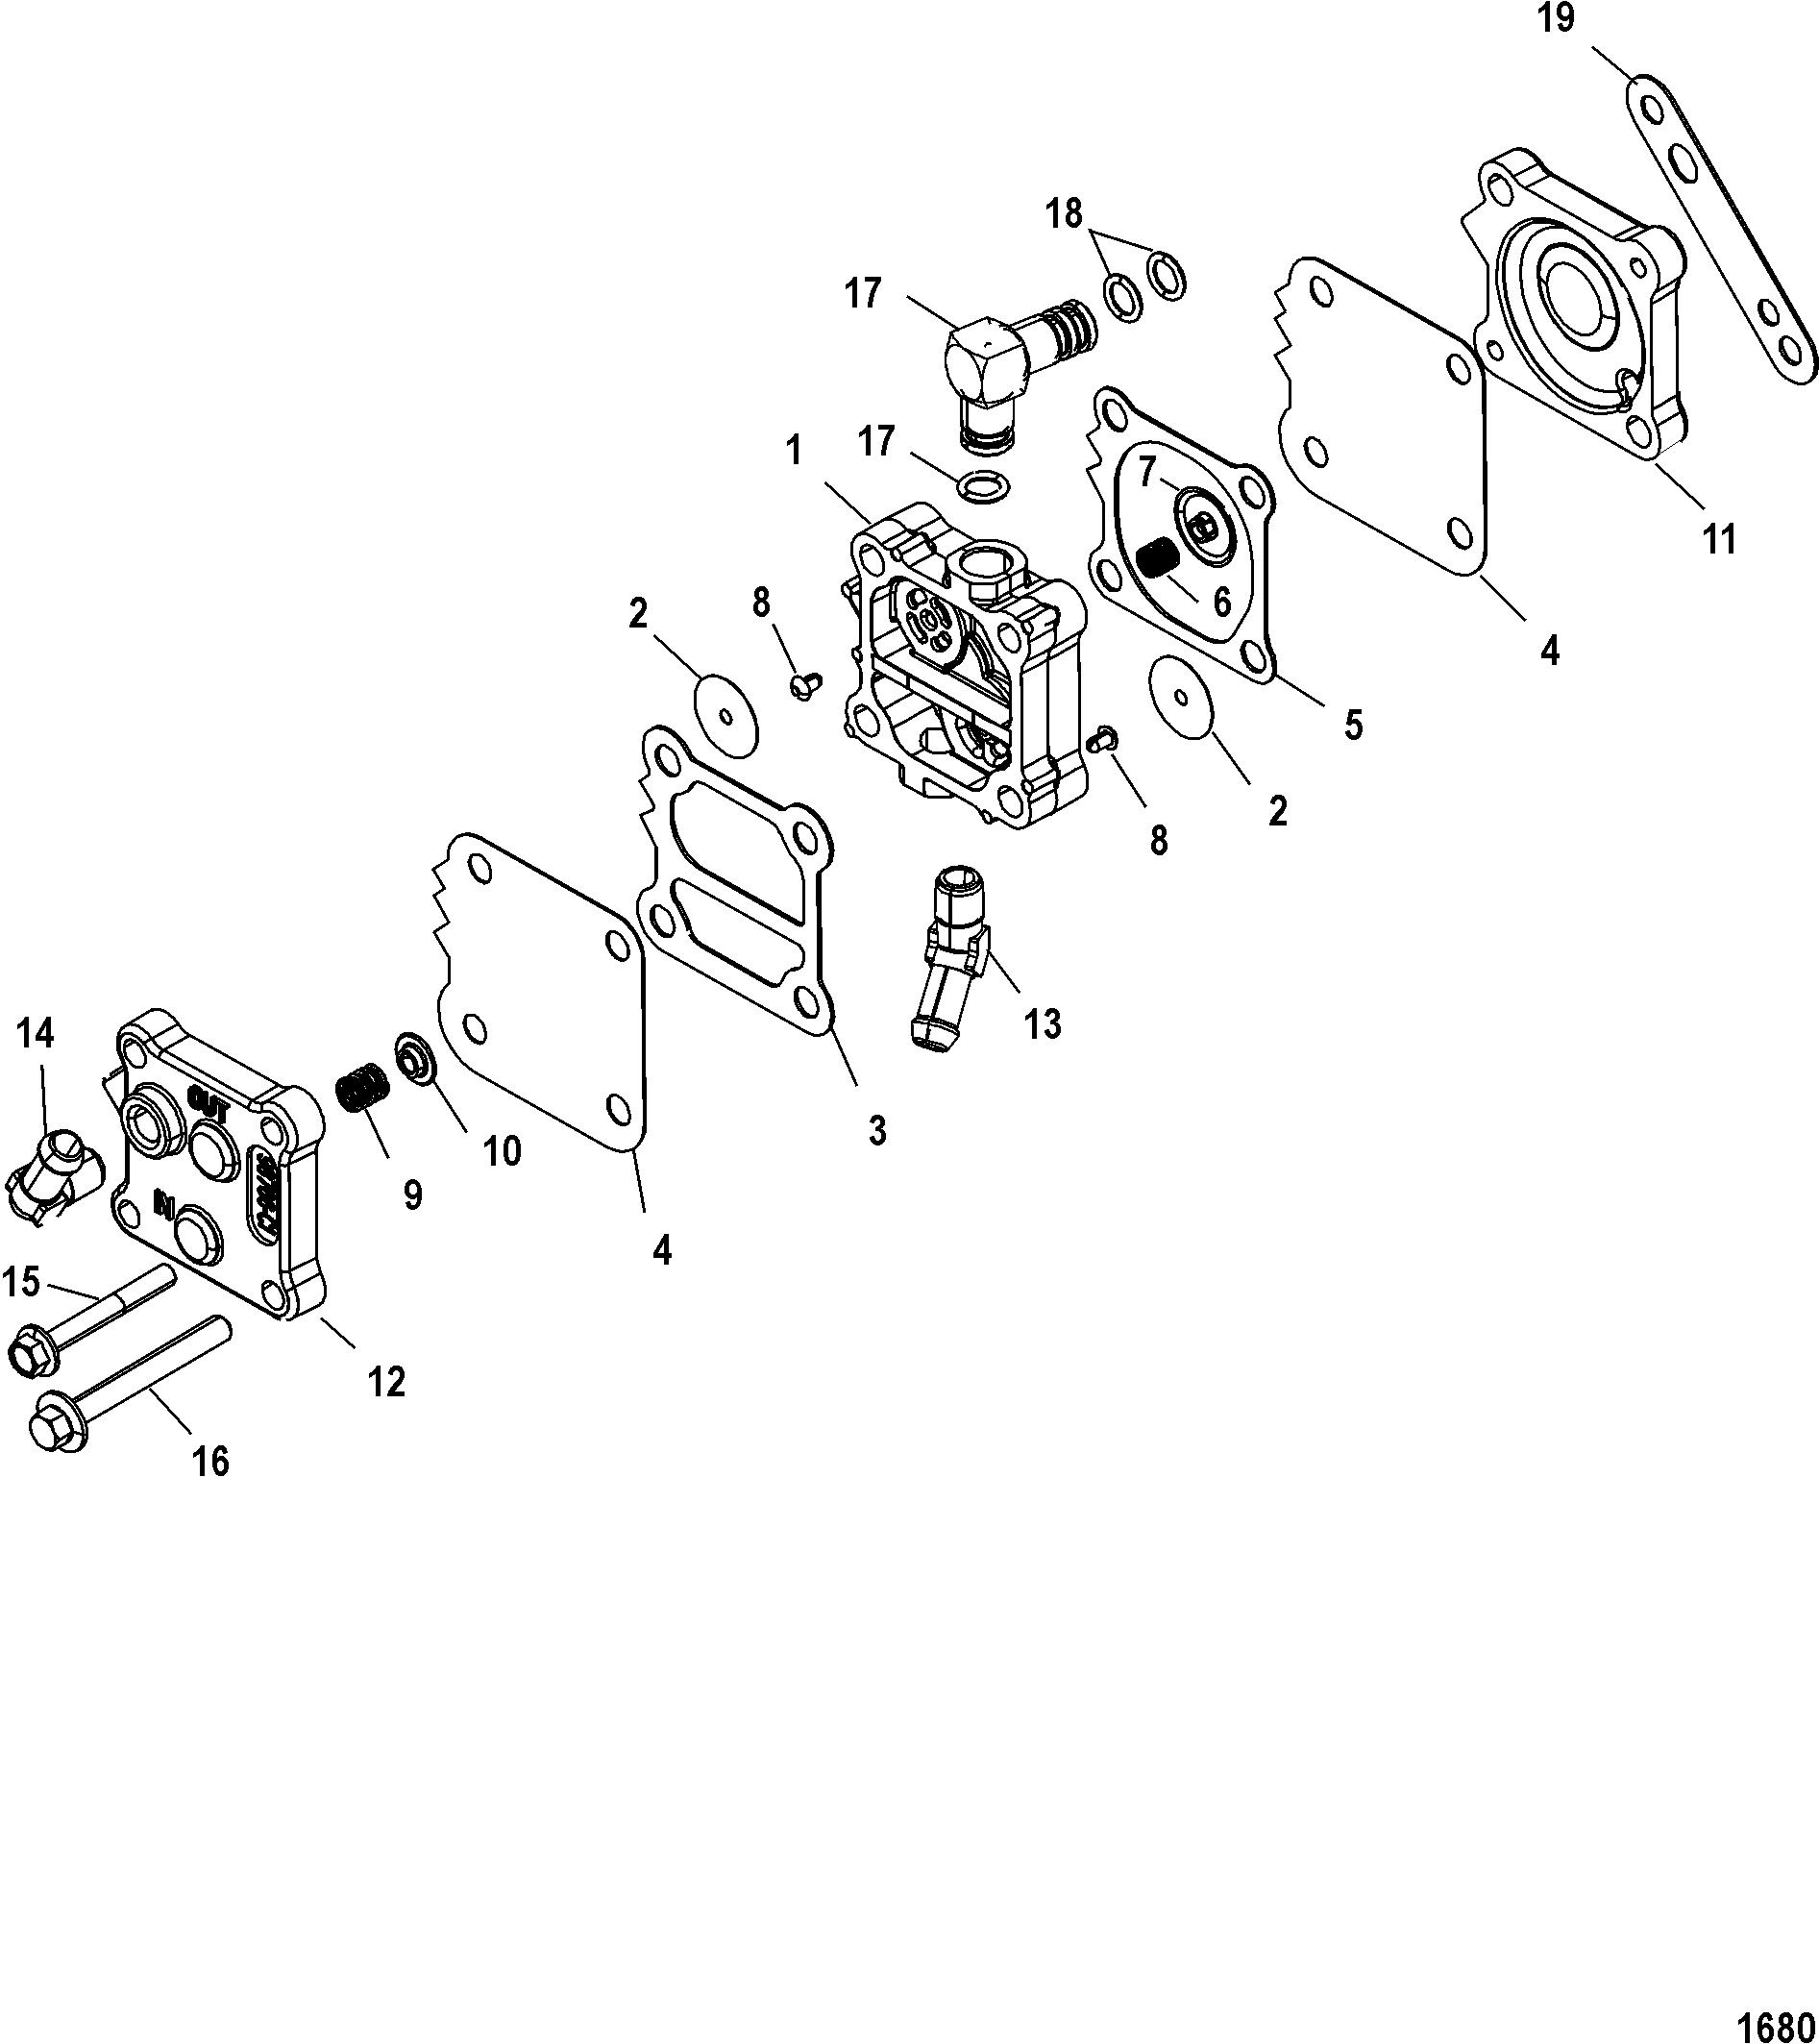 Fuel Pump FOR MARINER / MERCURY 75/90/115 DFI 1.5L 3 CYLINDER